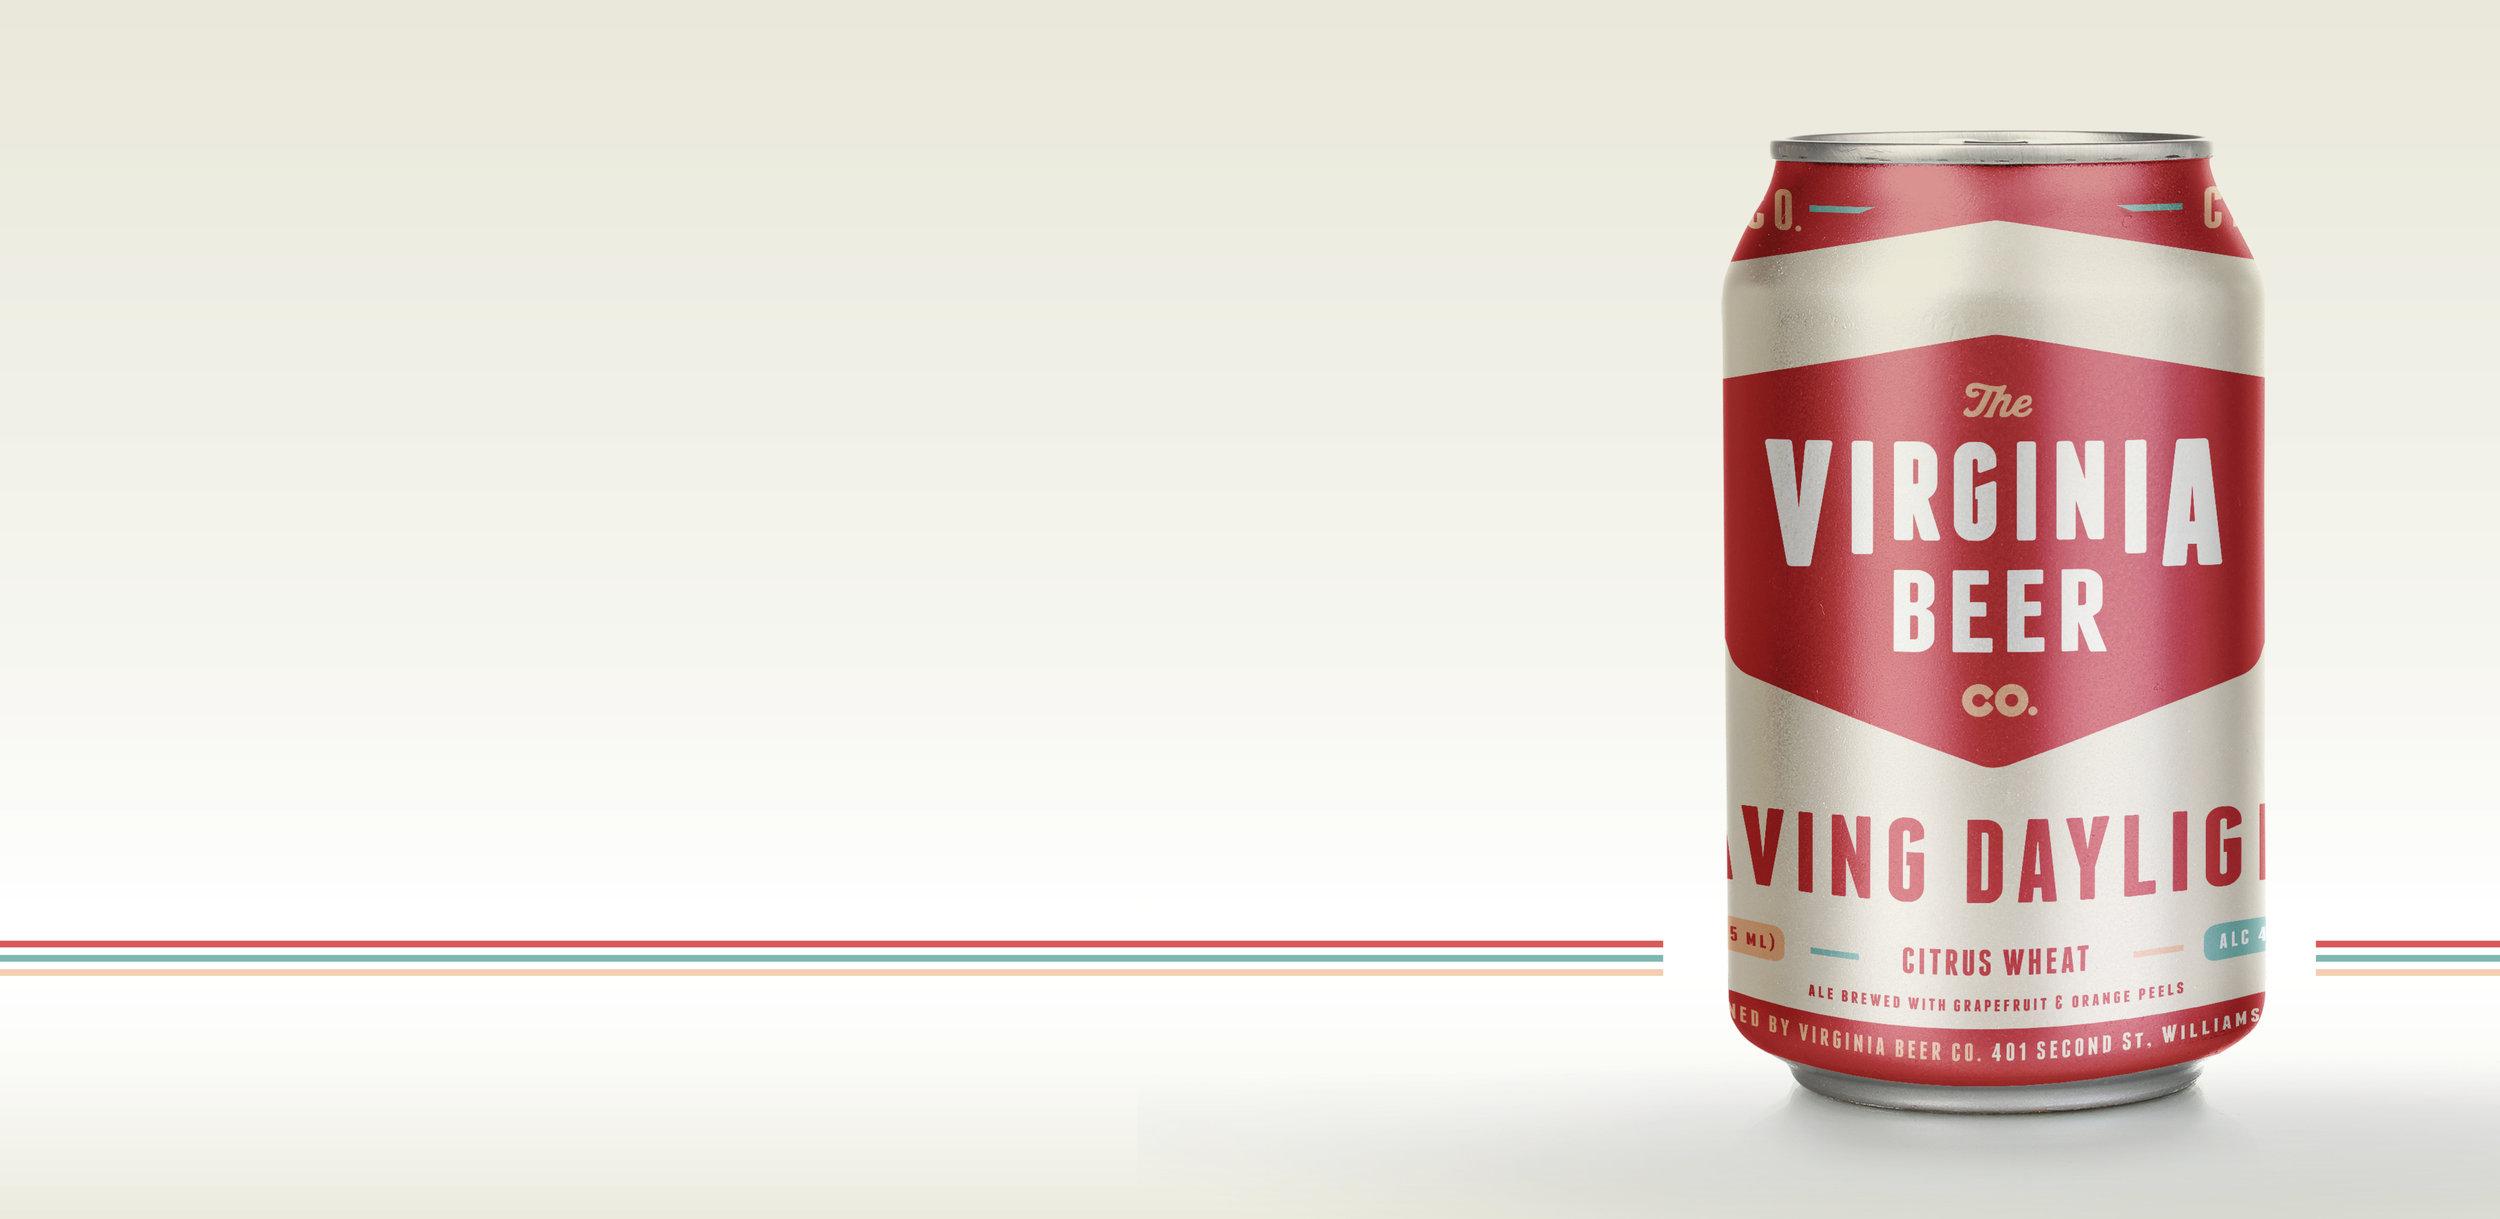 VBC_WebsiteSlider - Saving Daylight.jpg